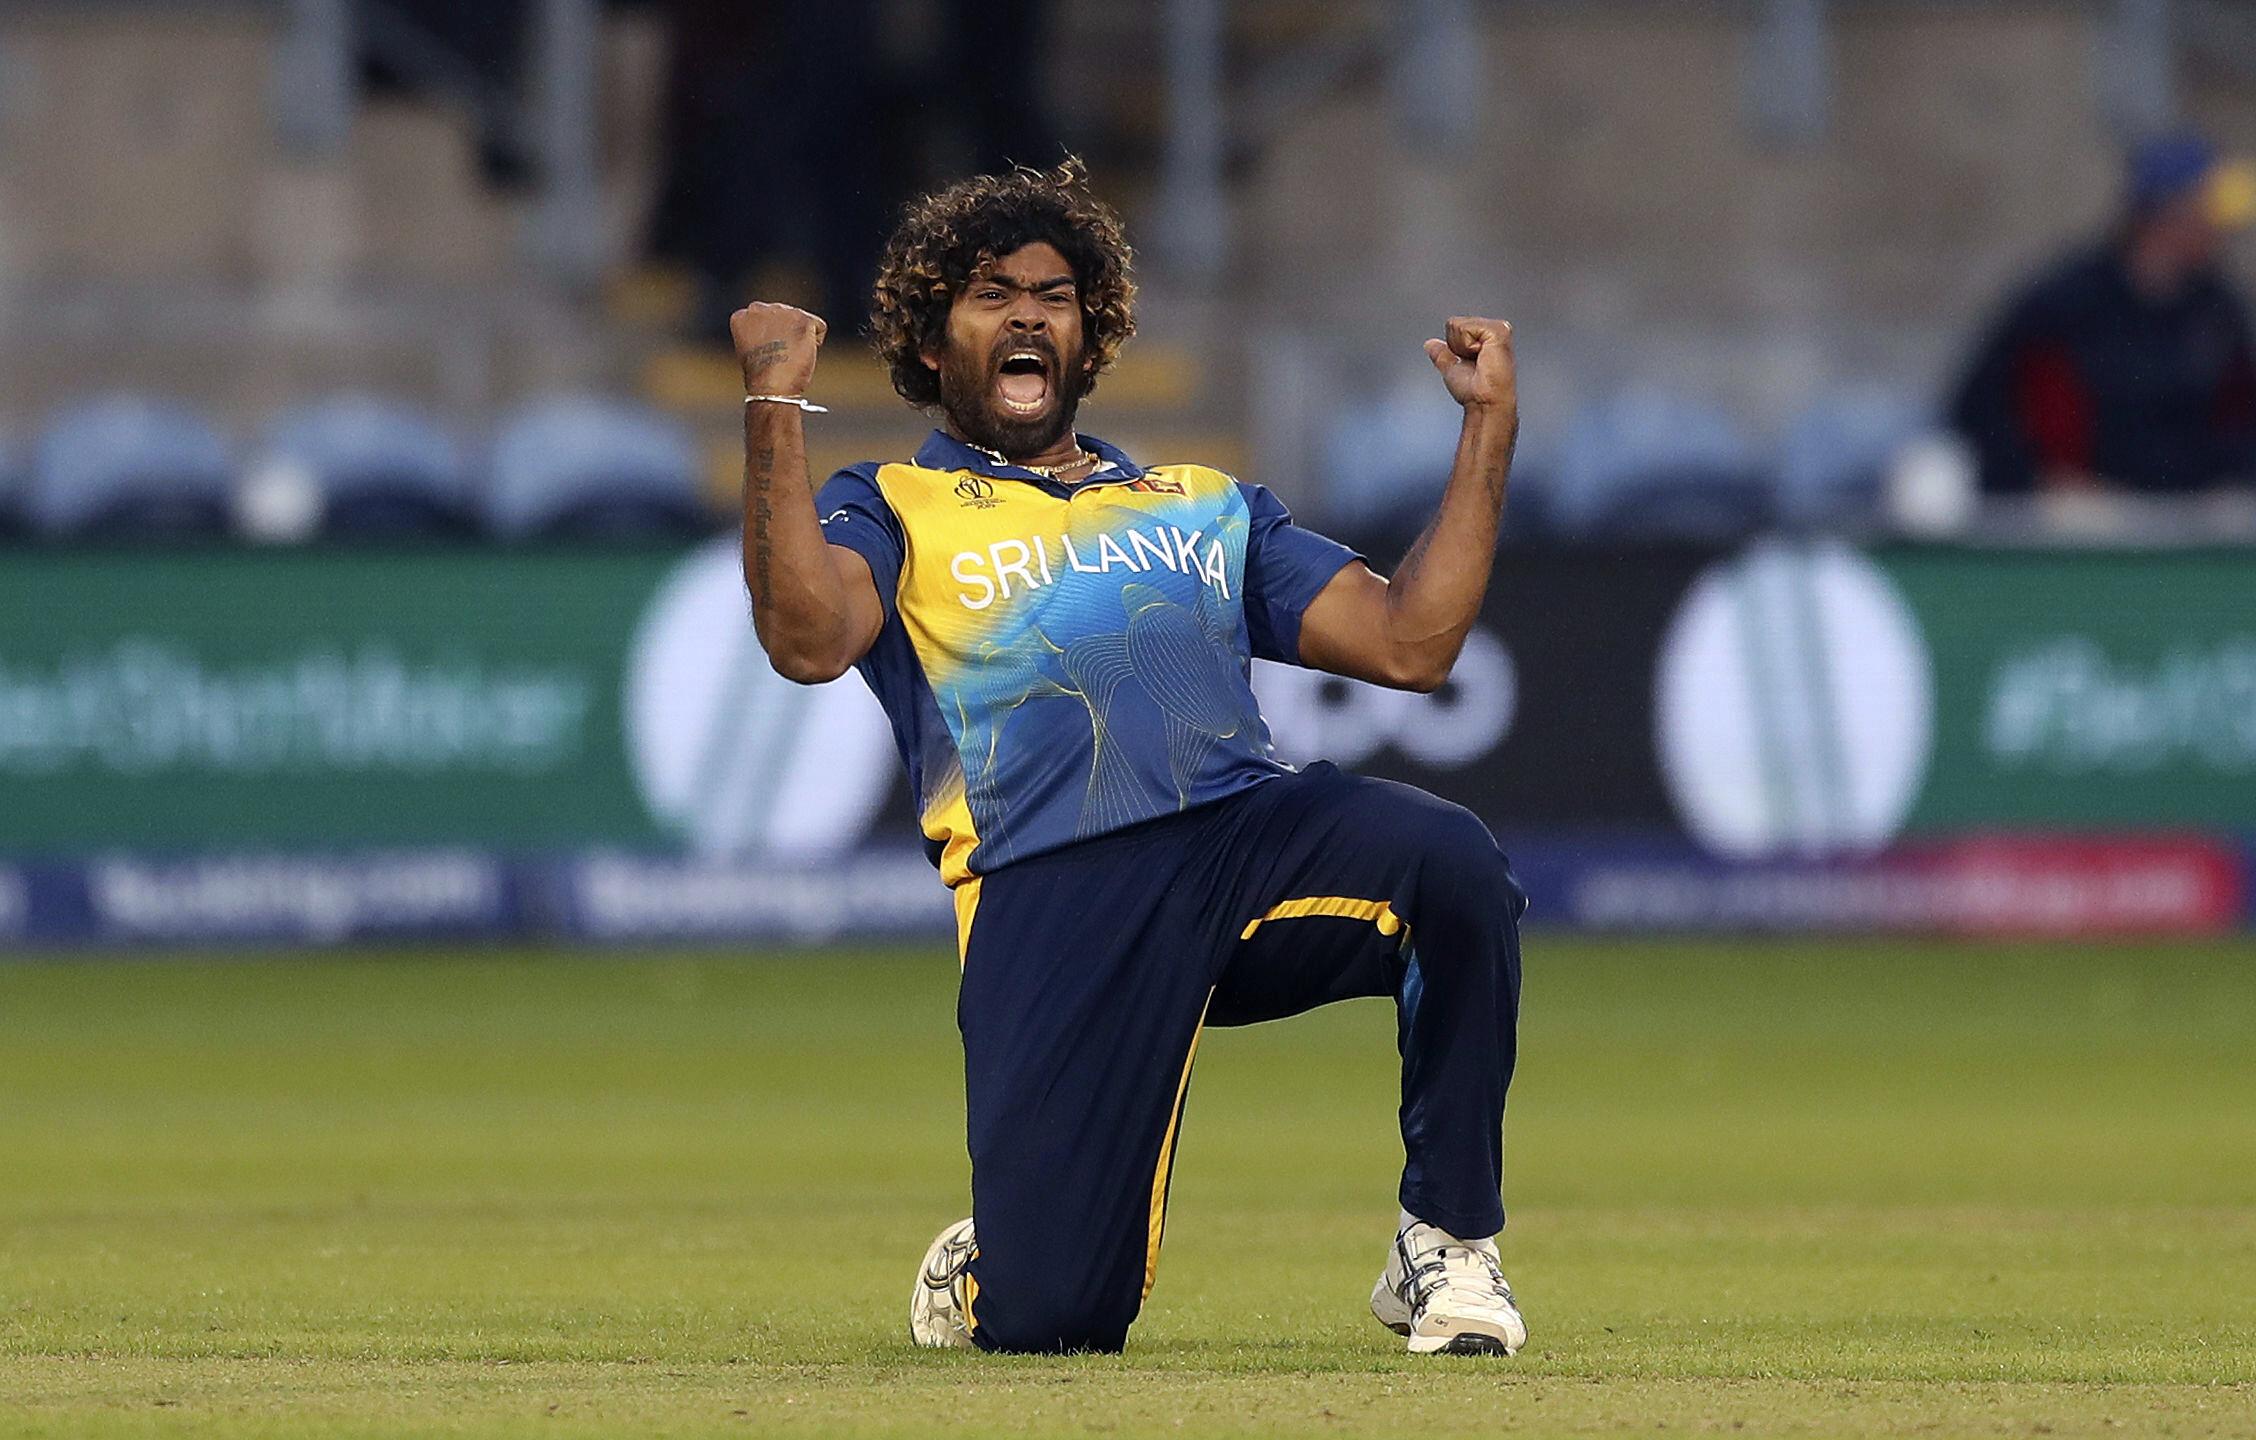 Sri Lanka's Lasith Malinga celebrates taking the wicket of Afghanistan's Hamid Hassan at the Cardiff Stadium on June 4.